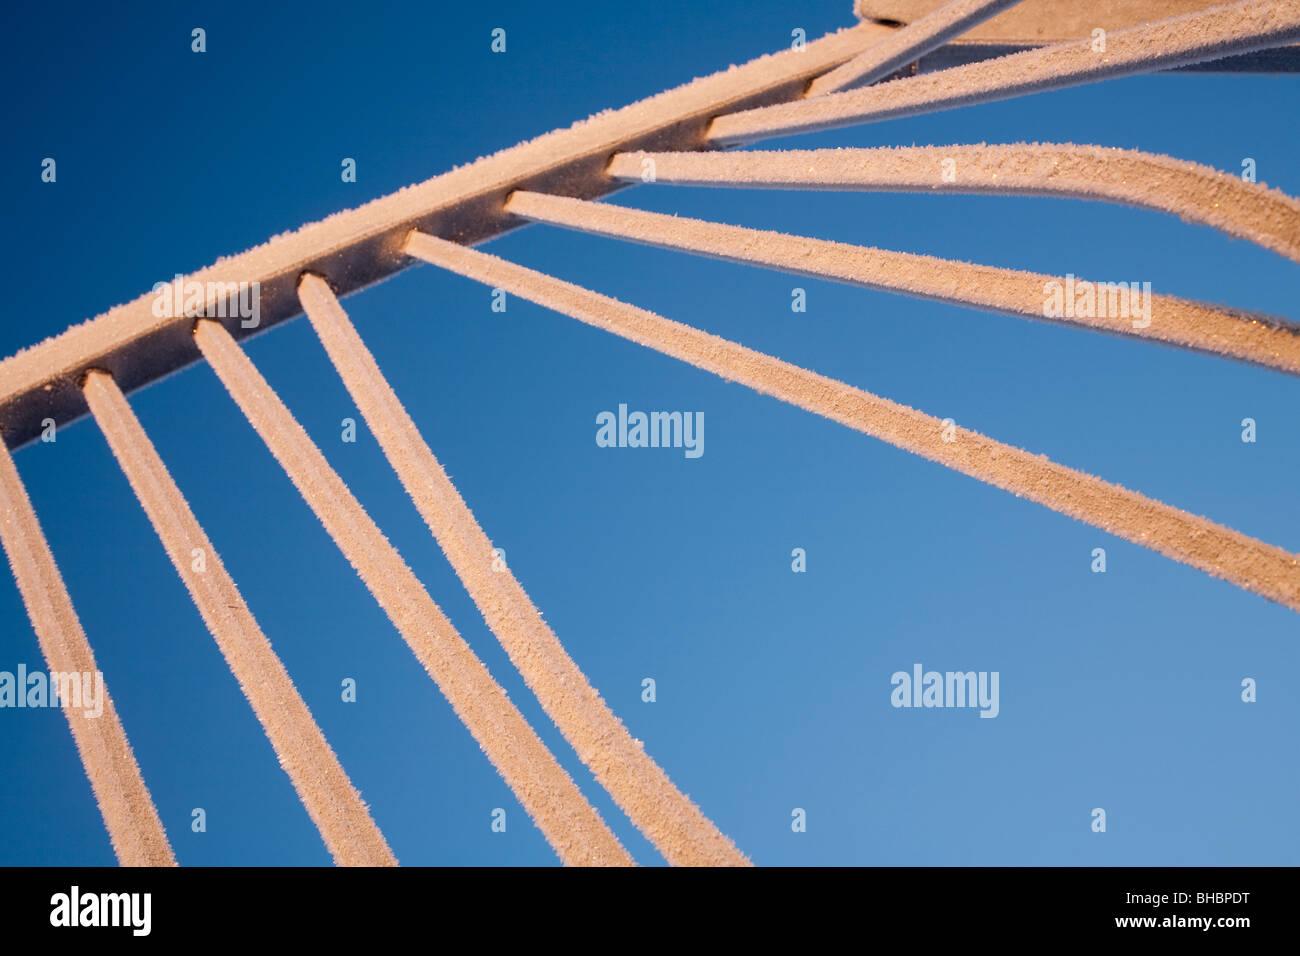 Frosty steel bars against blue sky - Stock Image